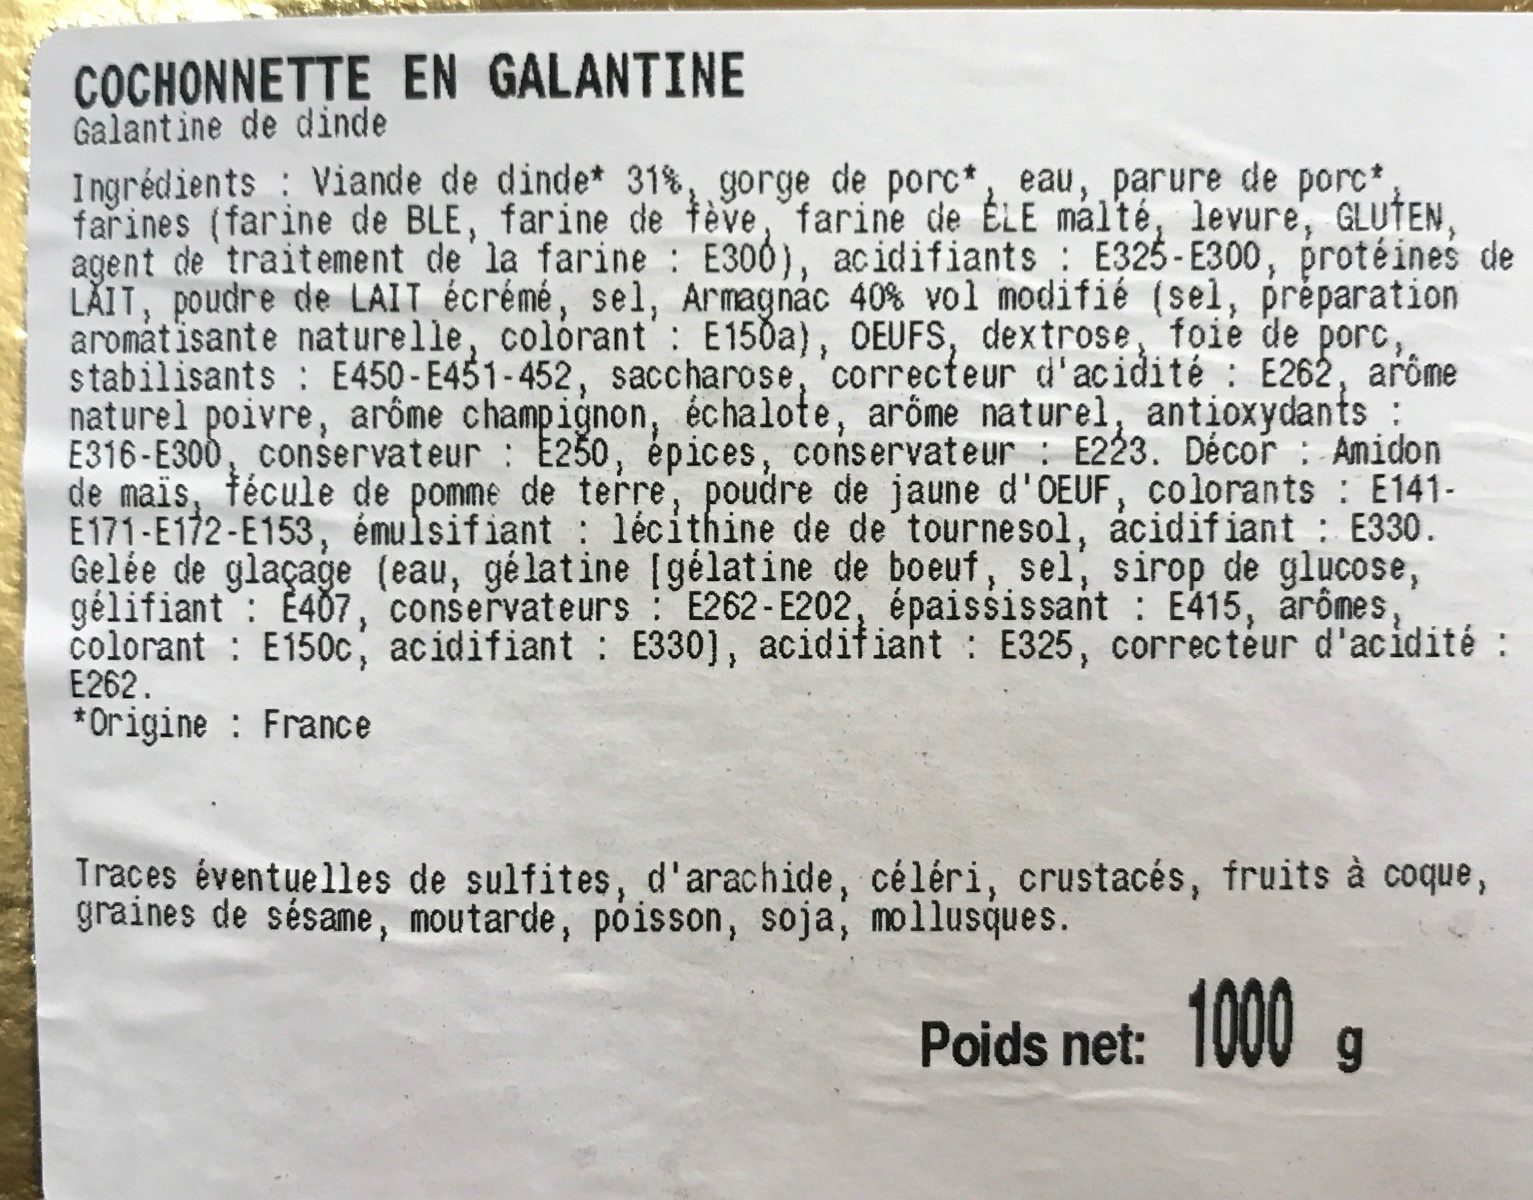 Cochonette en galantine - Ingrediënten